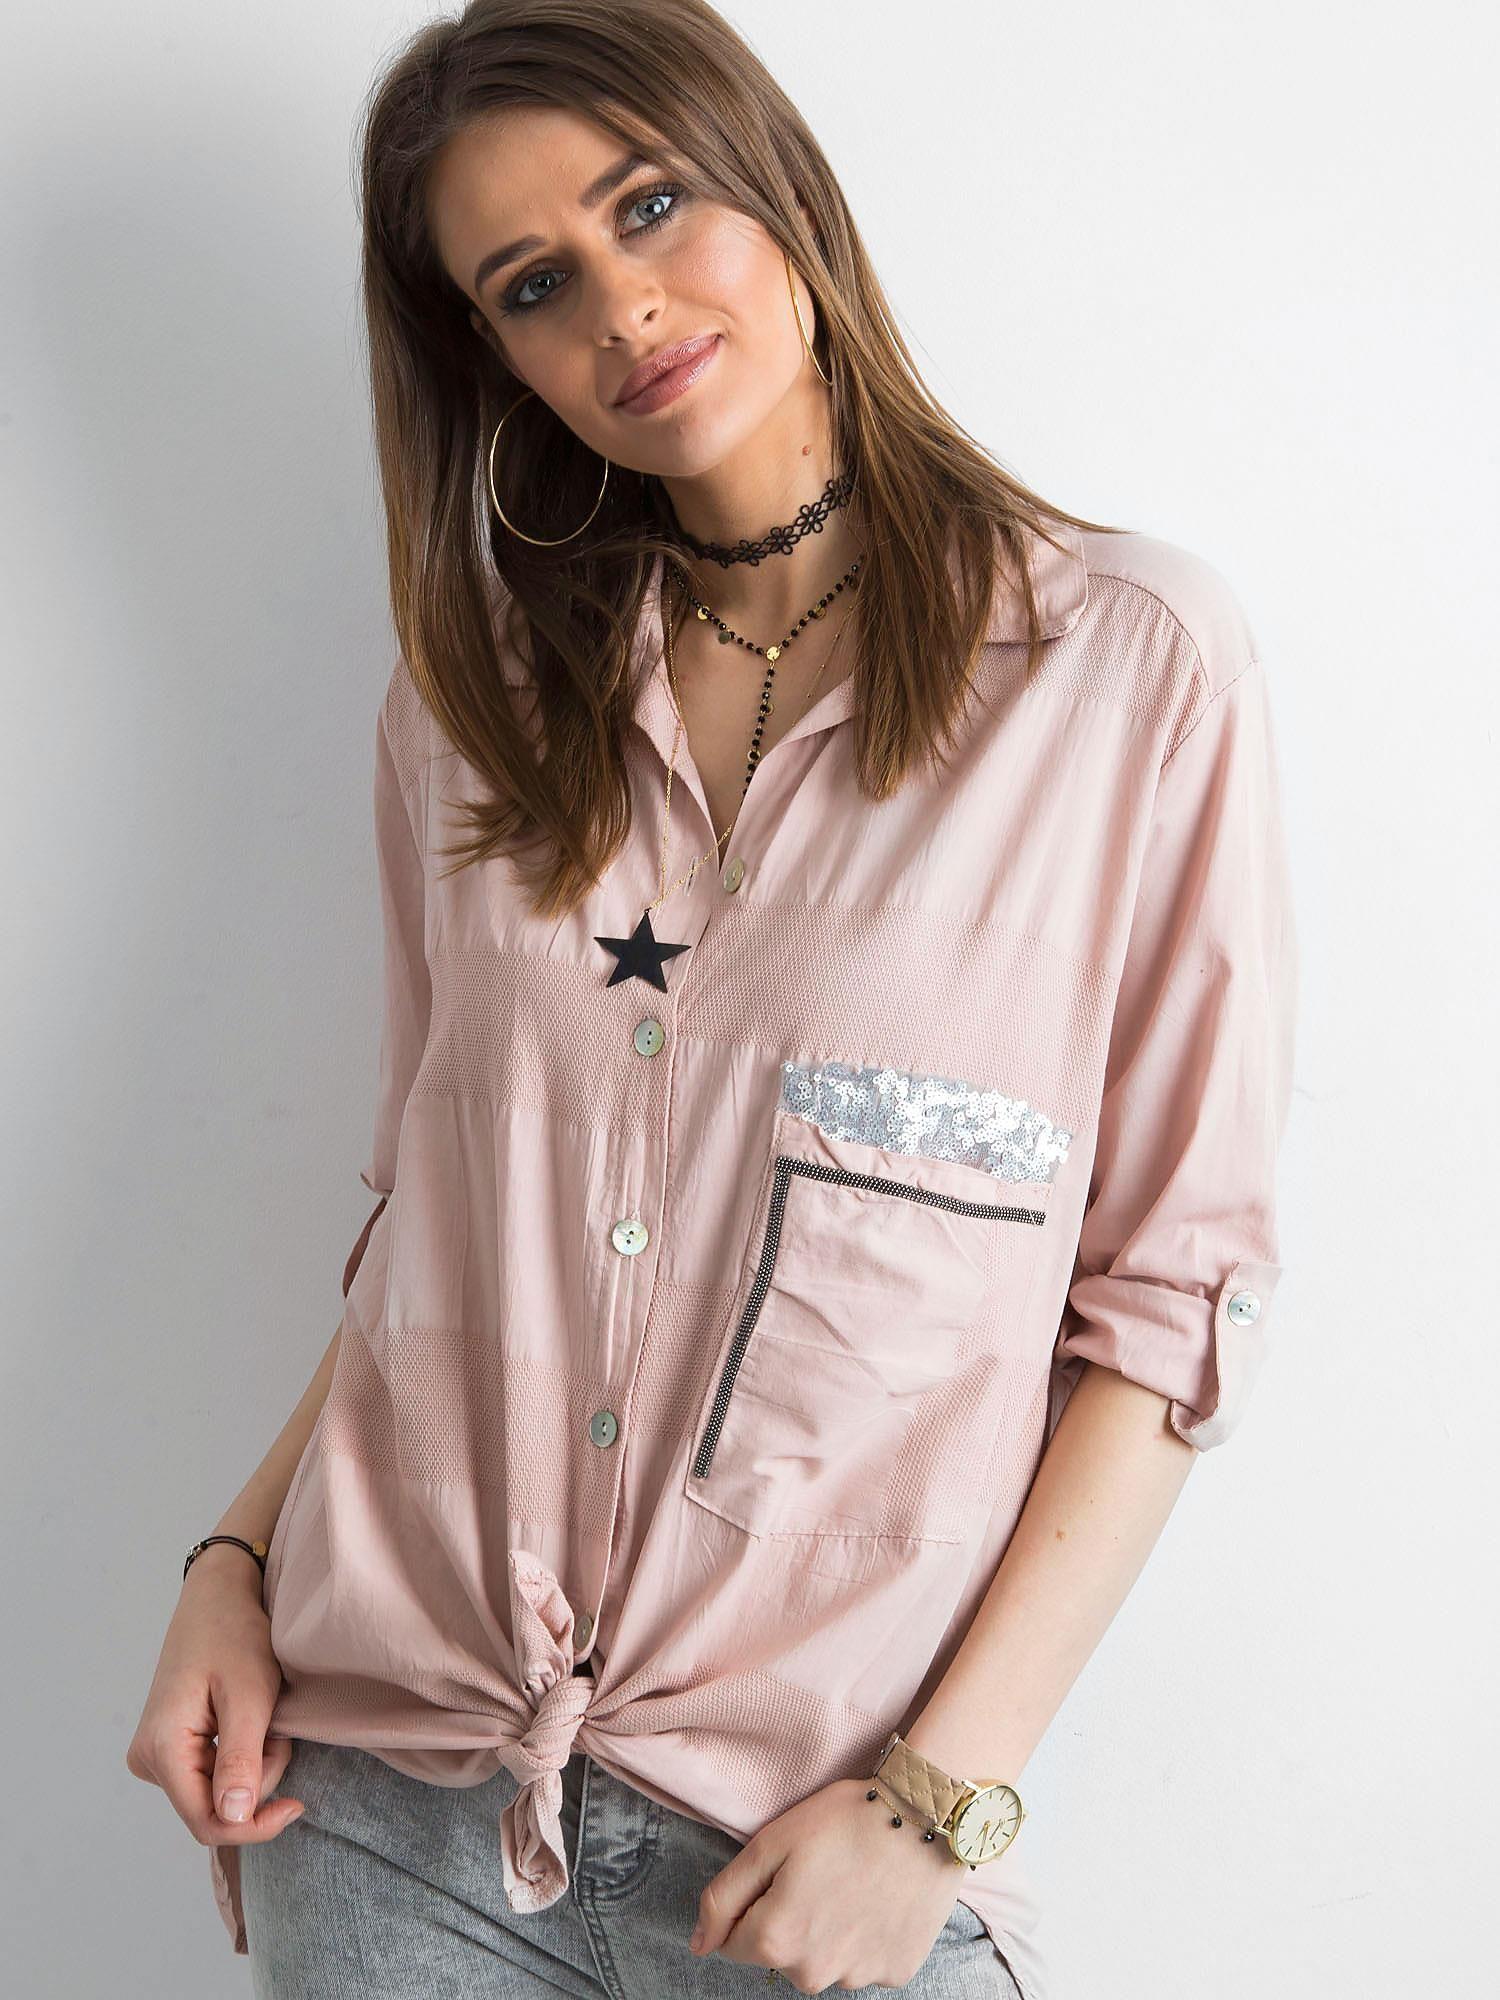 4d1d461a9432ad Różowa koszula damska - Koszula klasyczna - sklep eButik.pl